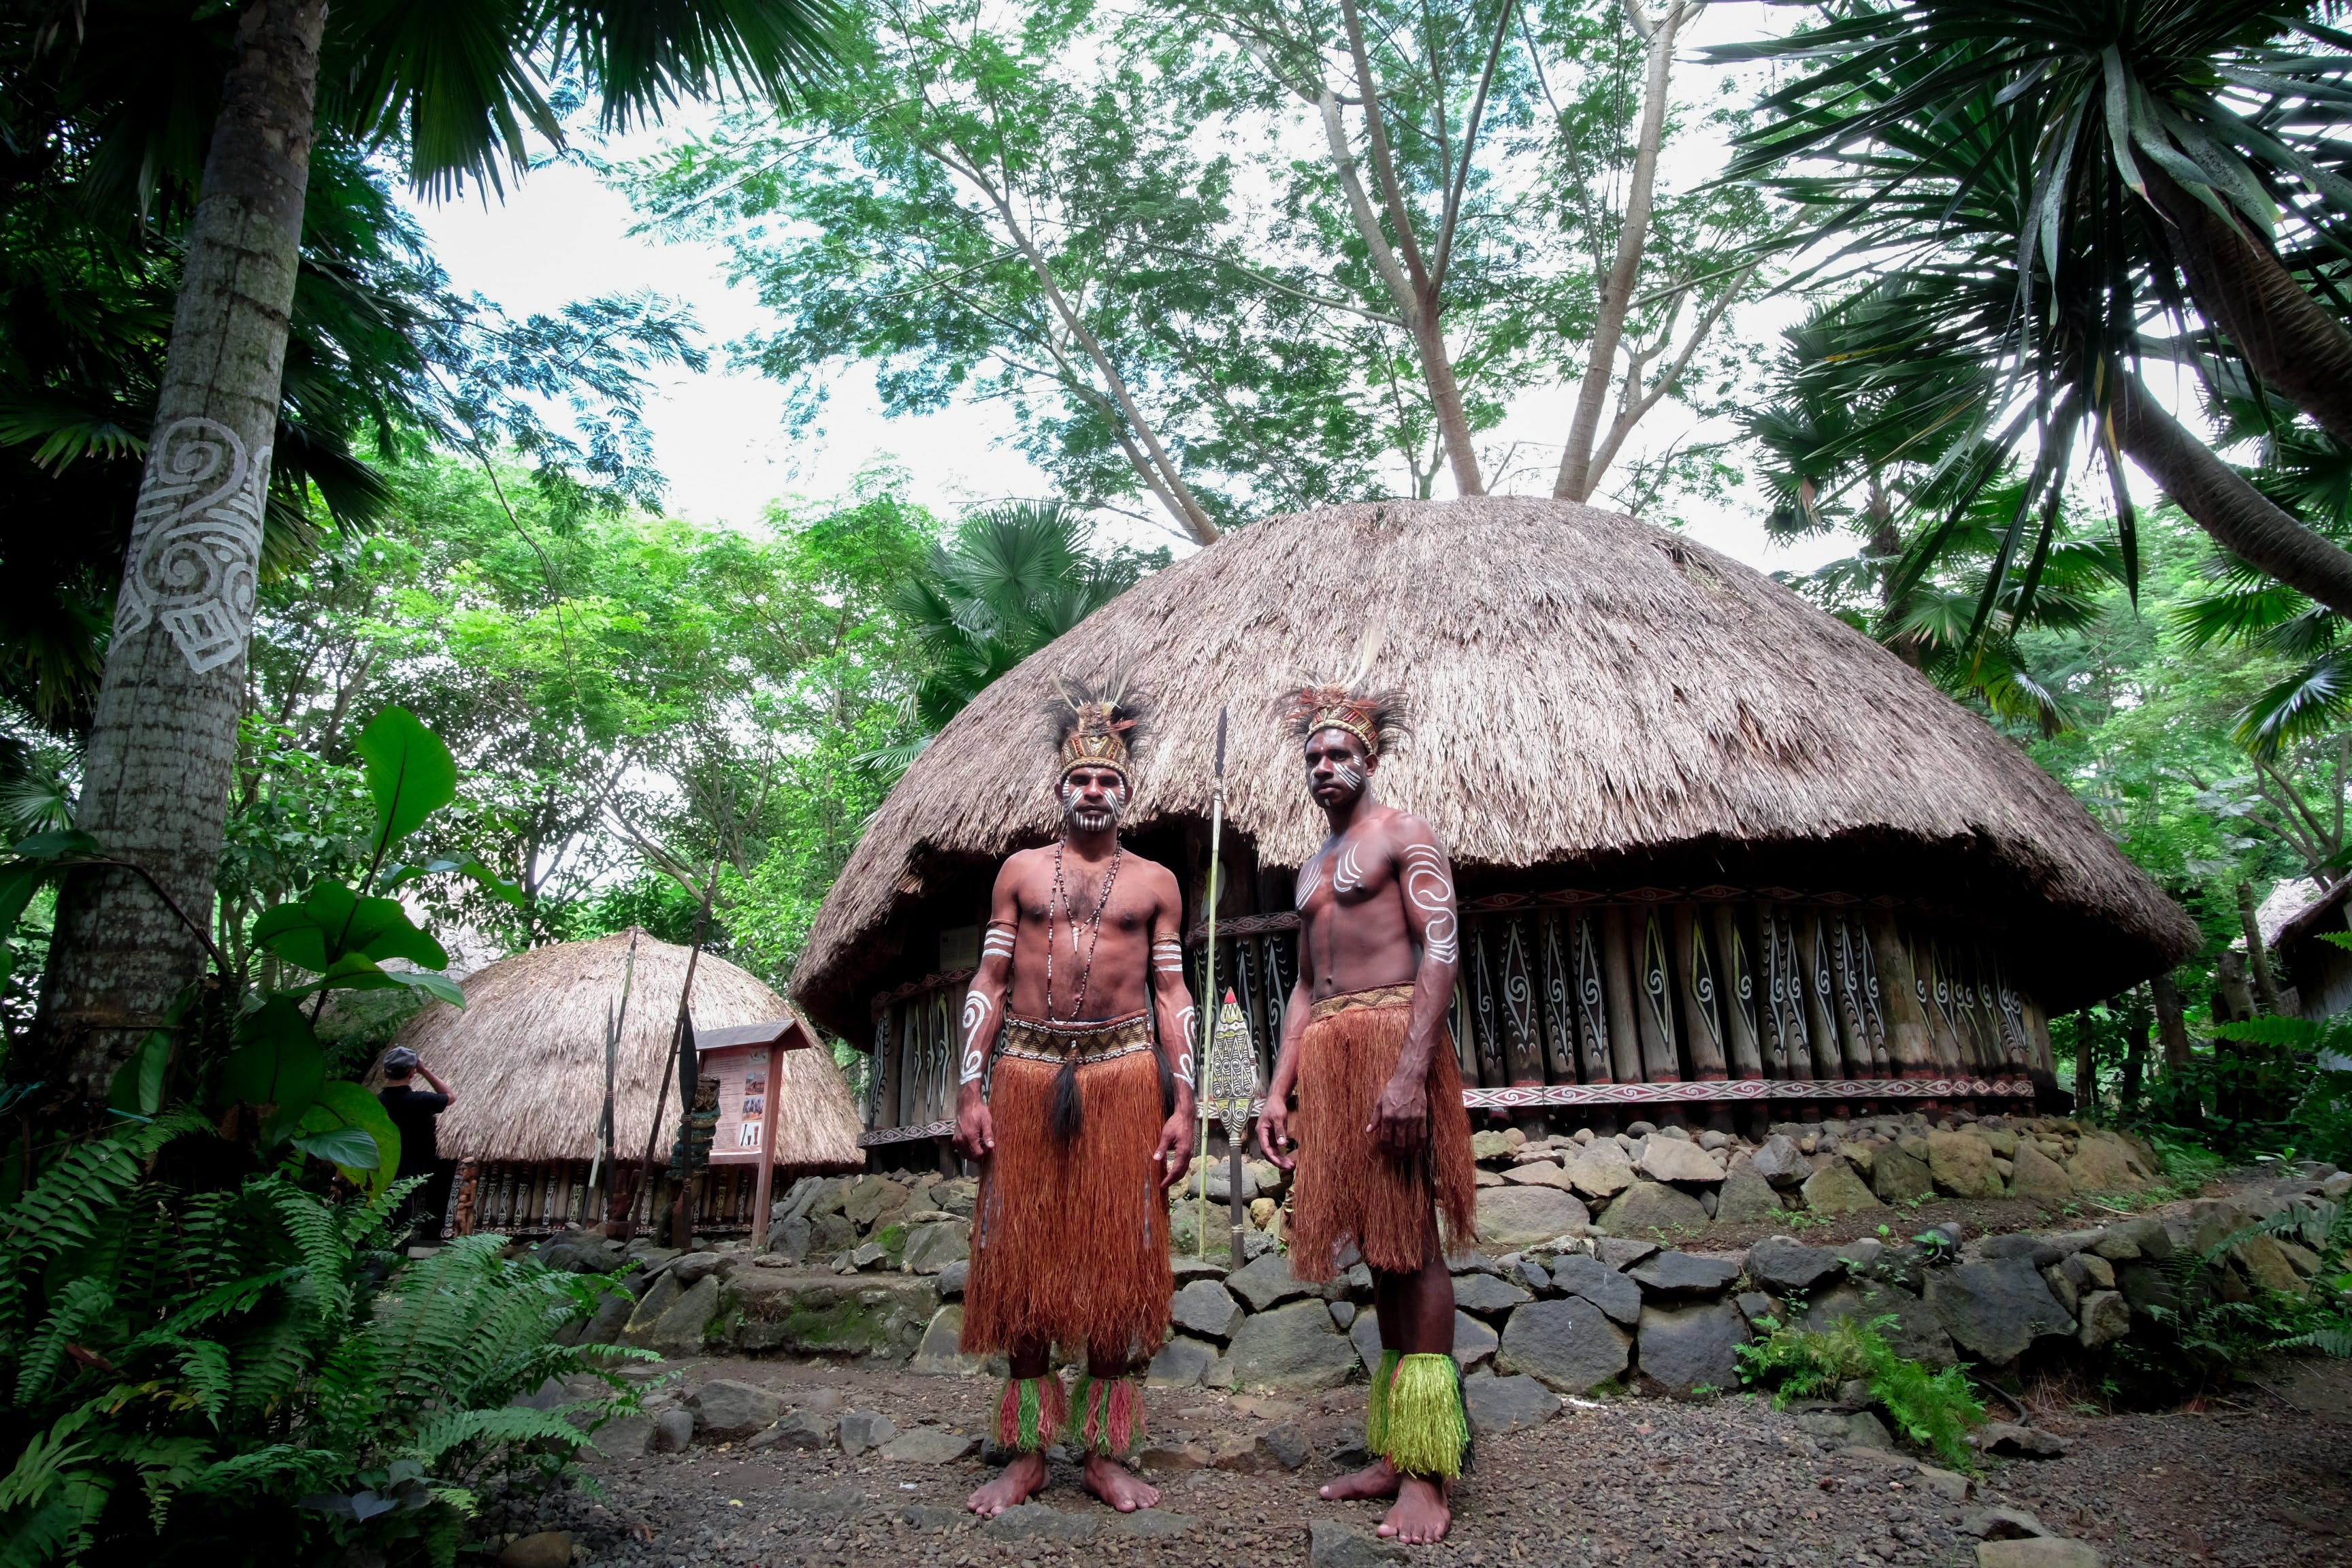 Tribesmen of the Amazon jungle.